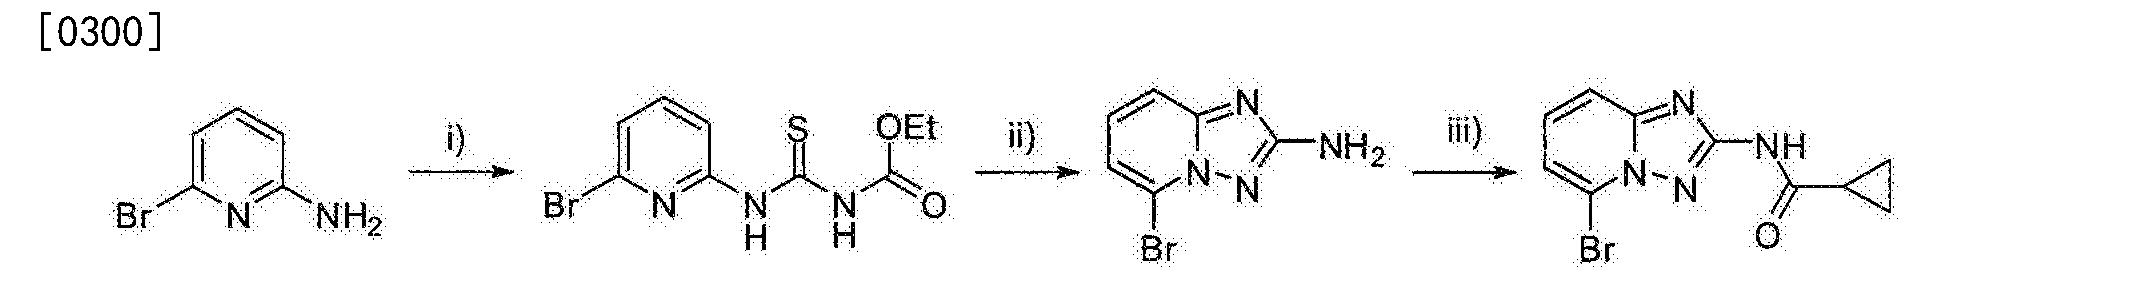 Figure CN105960407AD00333